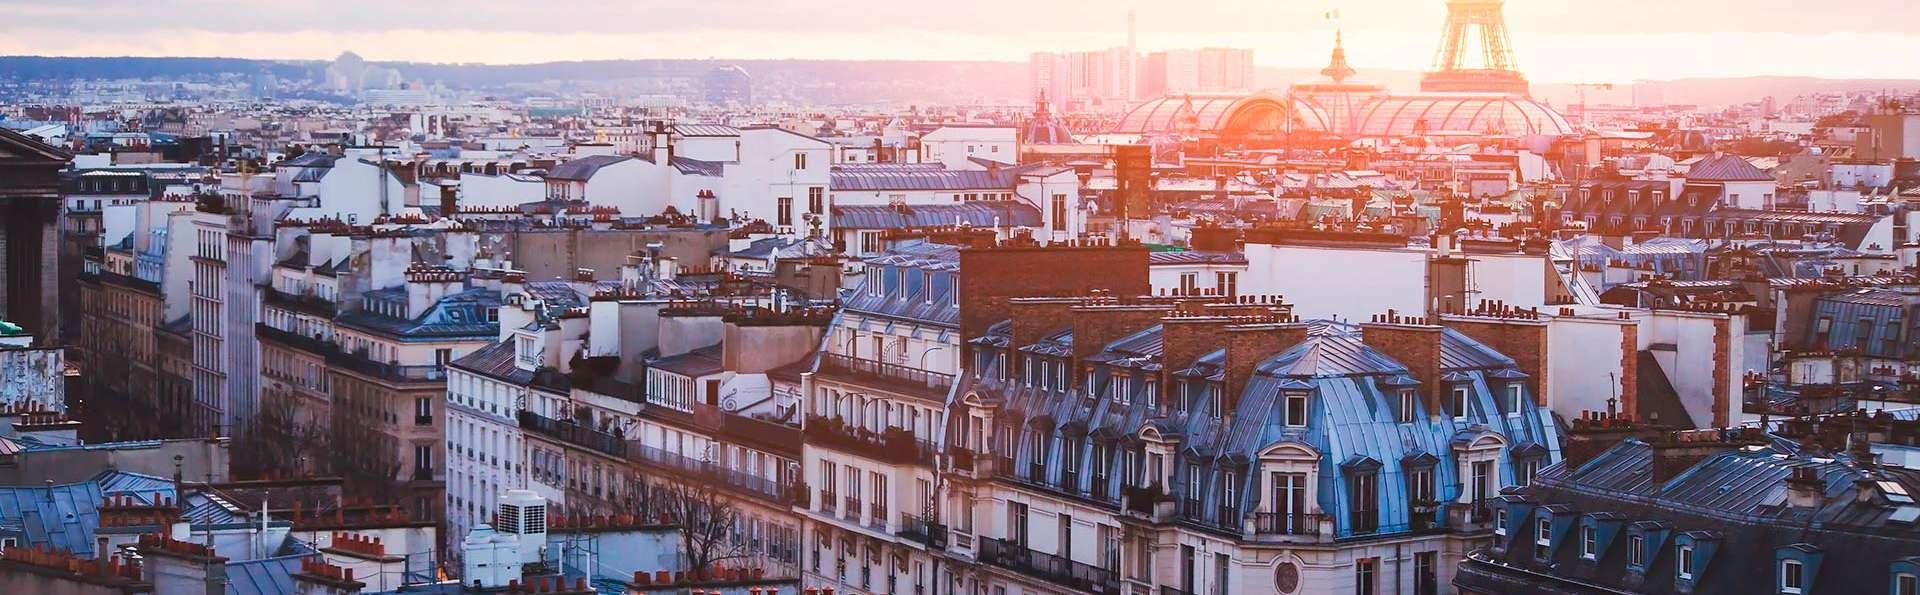 Timhotel Montmartre - EDIT_PARIS1.jpg